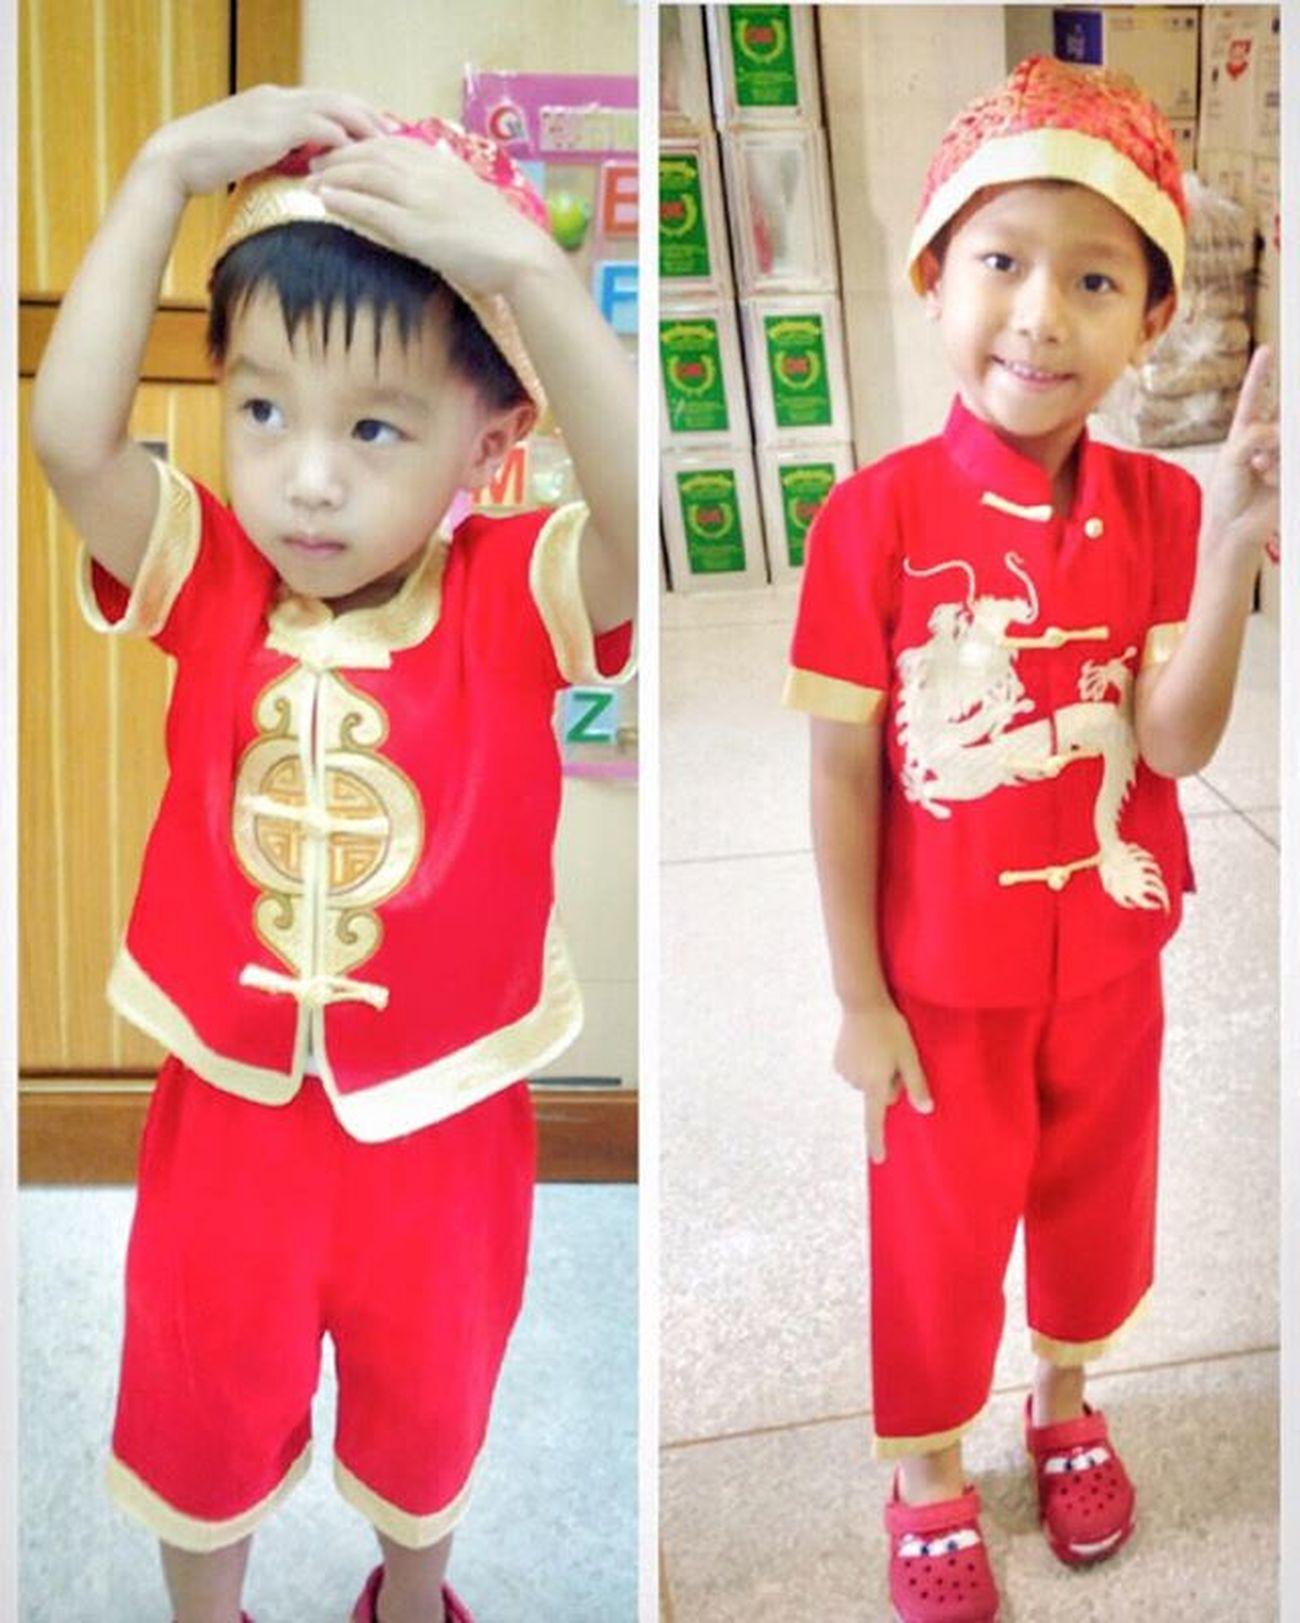 Happy Chiness new year อั่งเปา แจกตังค์ วันของเด็ก